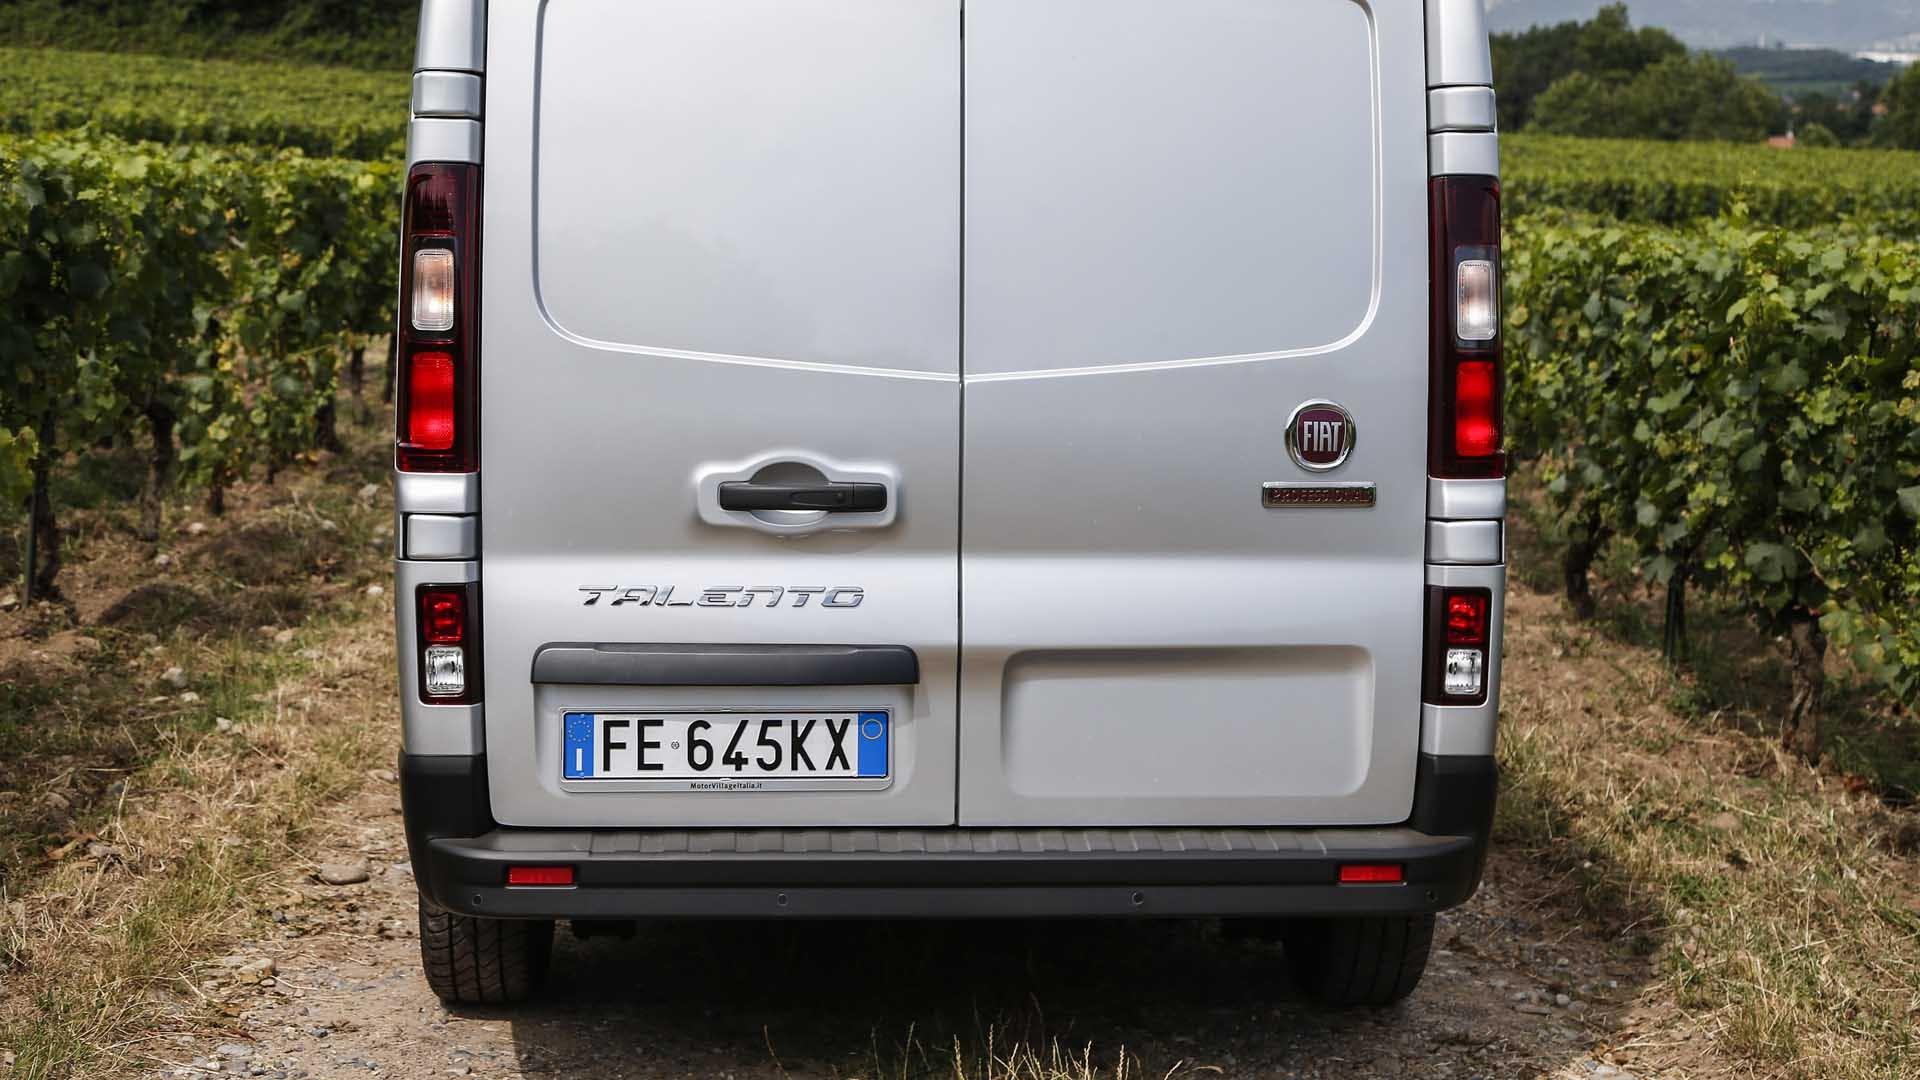 Fiat Talento bagfra grå statisk